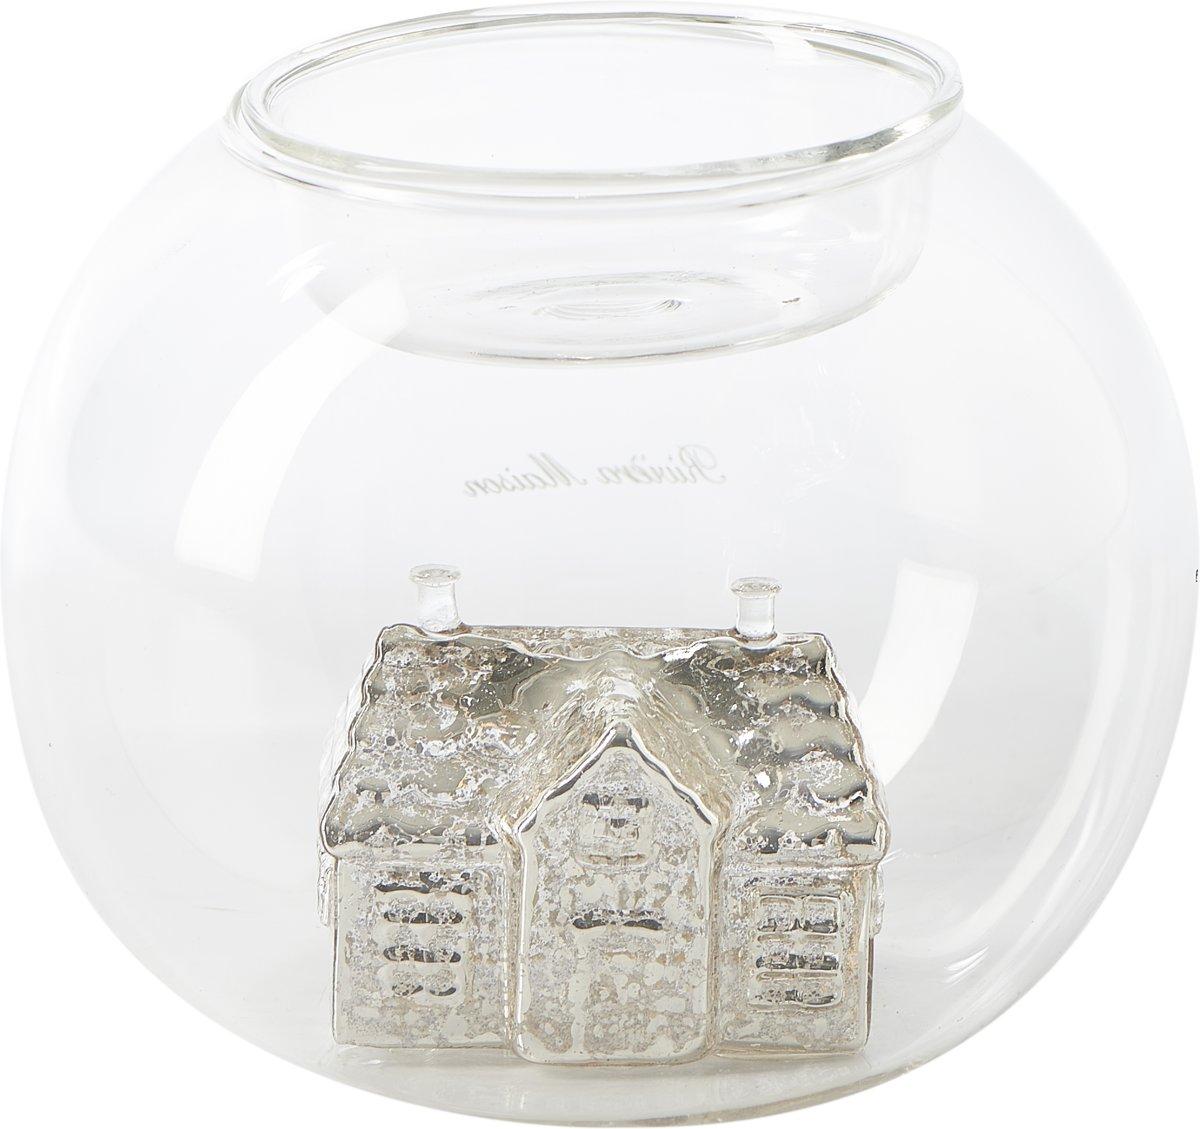 Beroemd bol.com | Riviera Maison Waxinelichthouder kopen? Kijk snel! &TO48